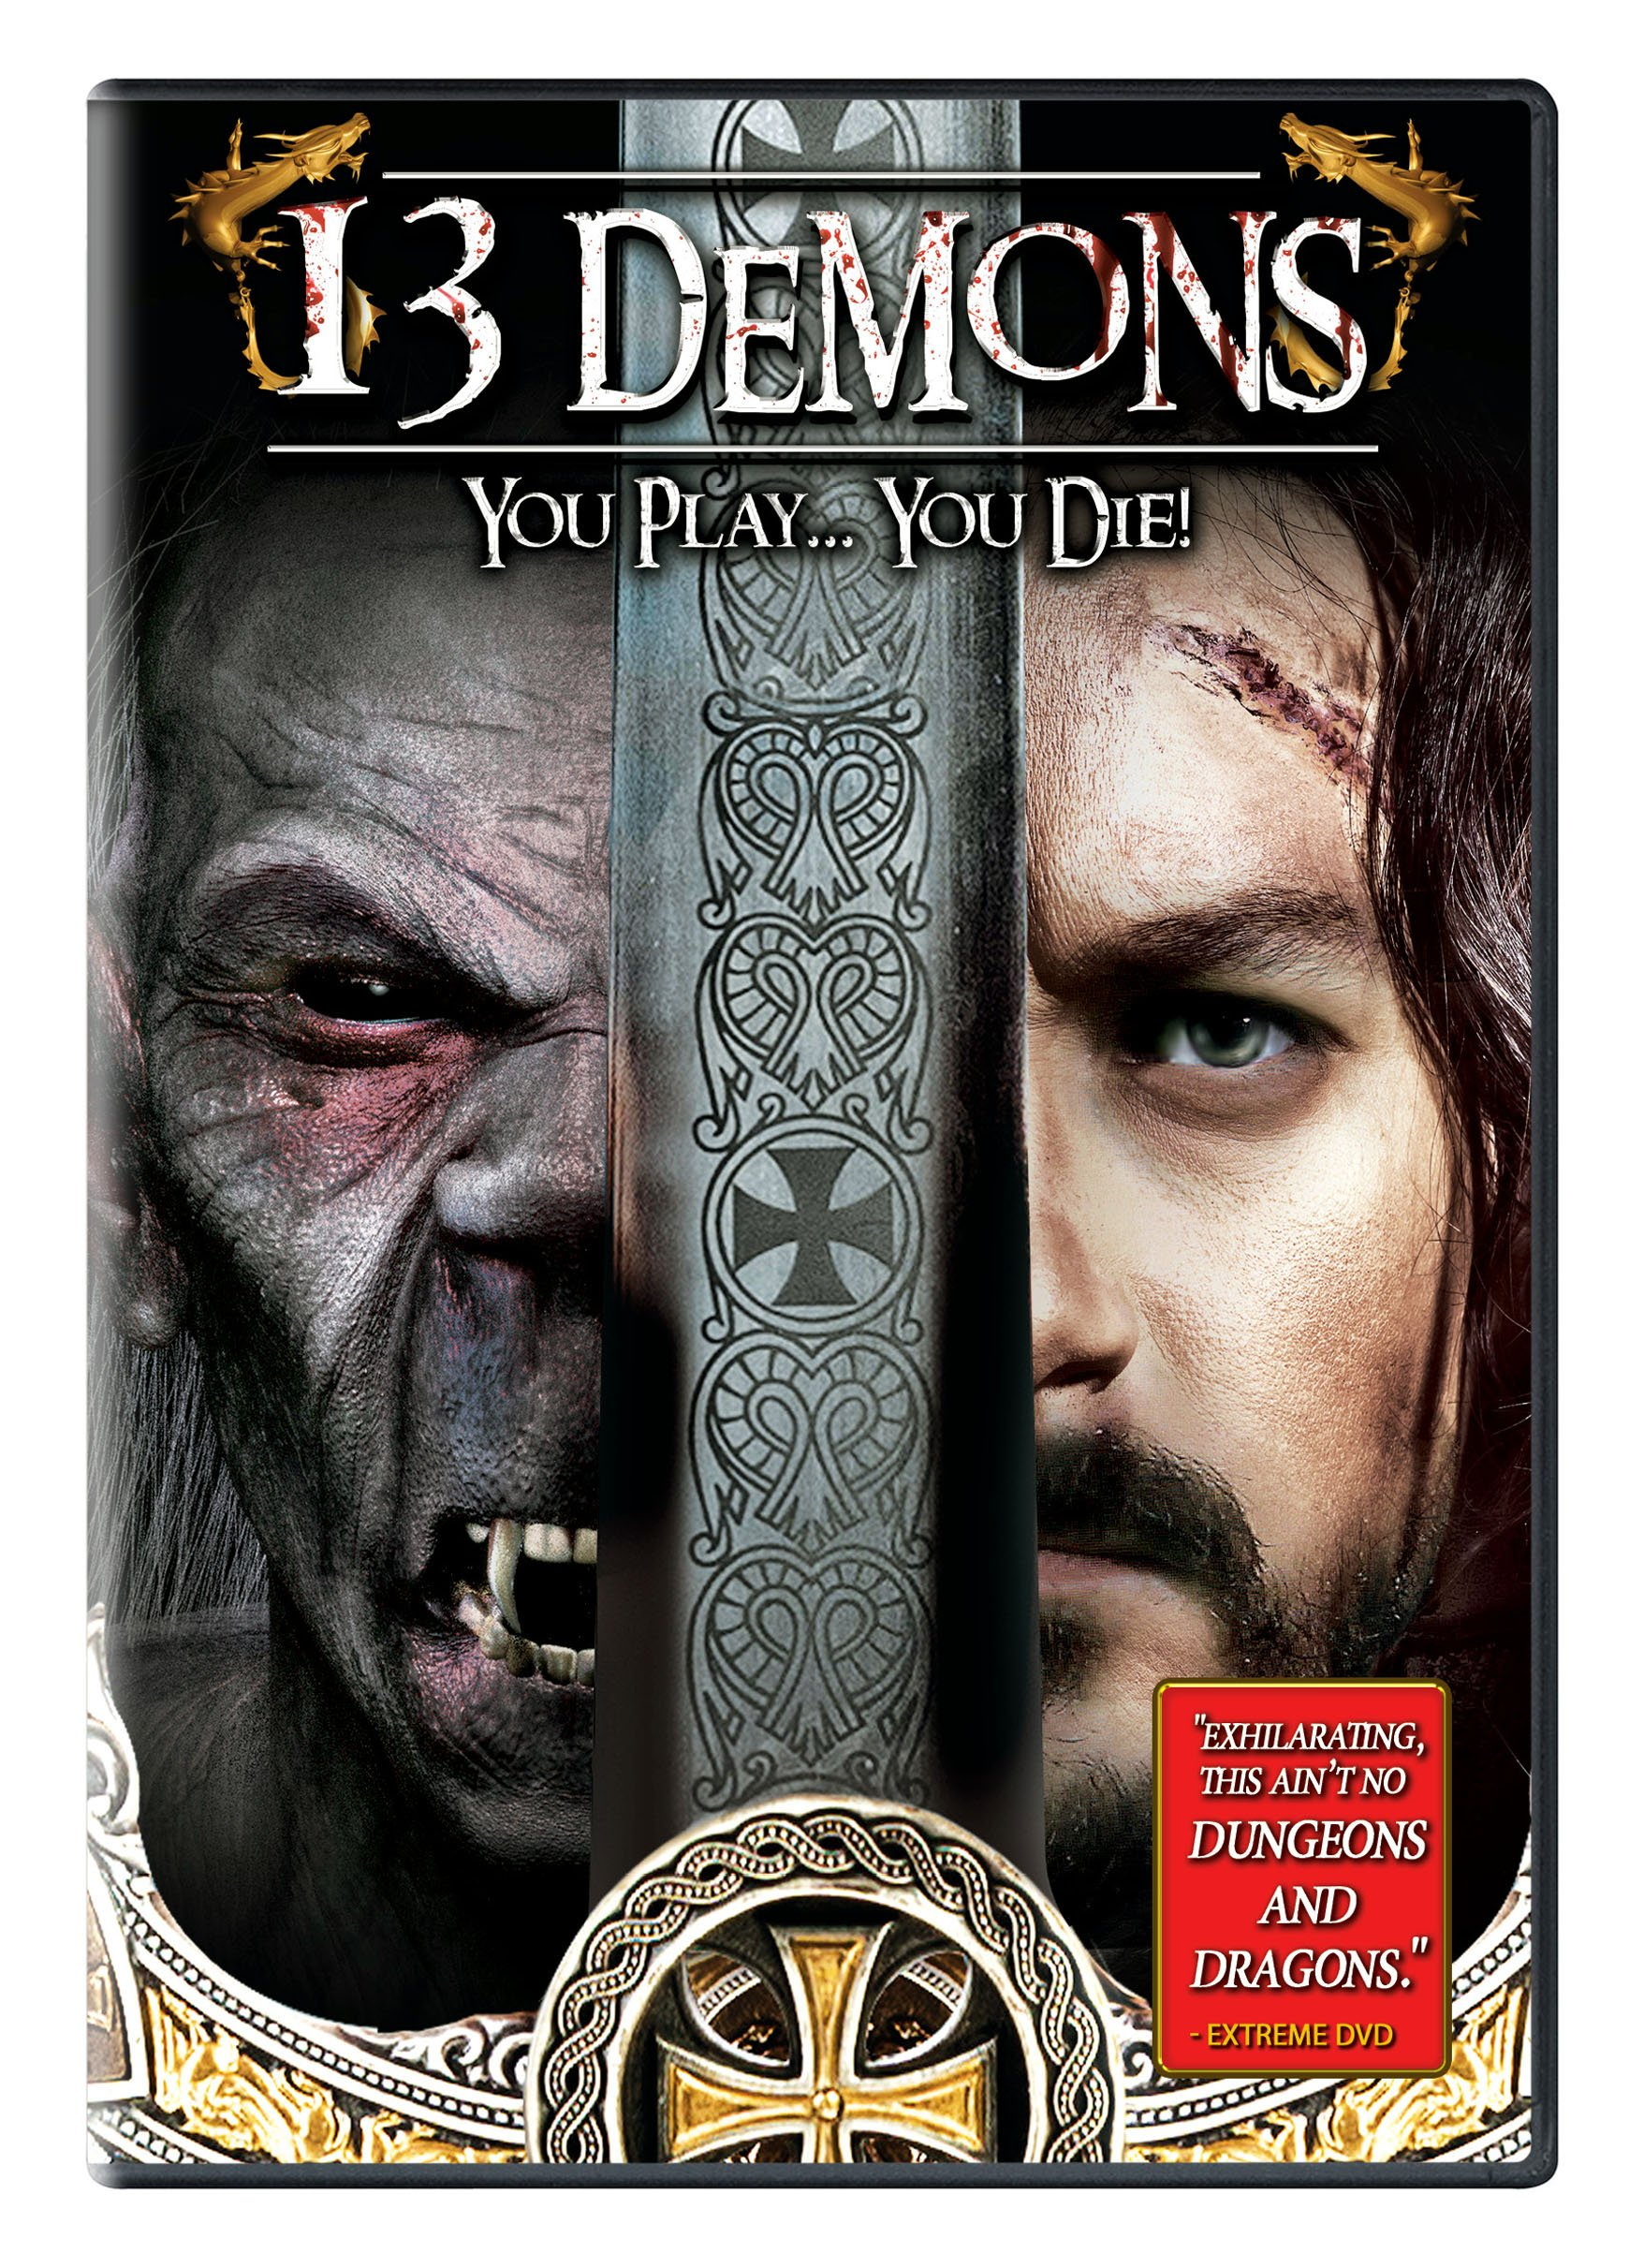 13 Demons (Widescreen)